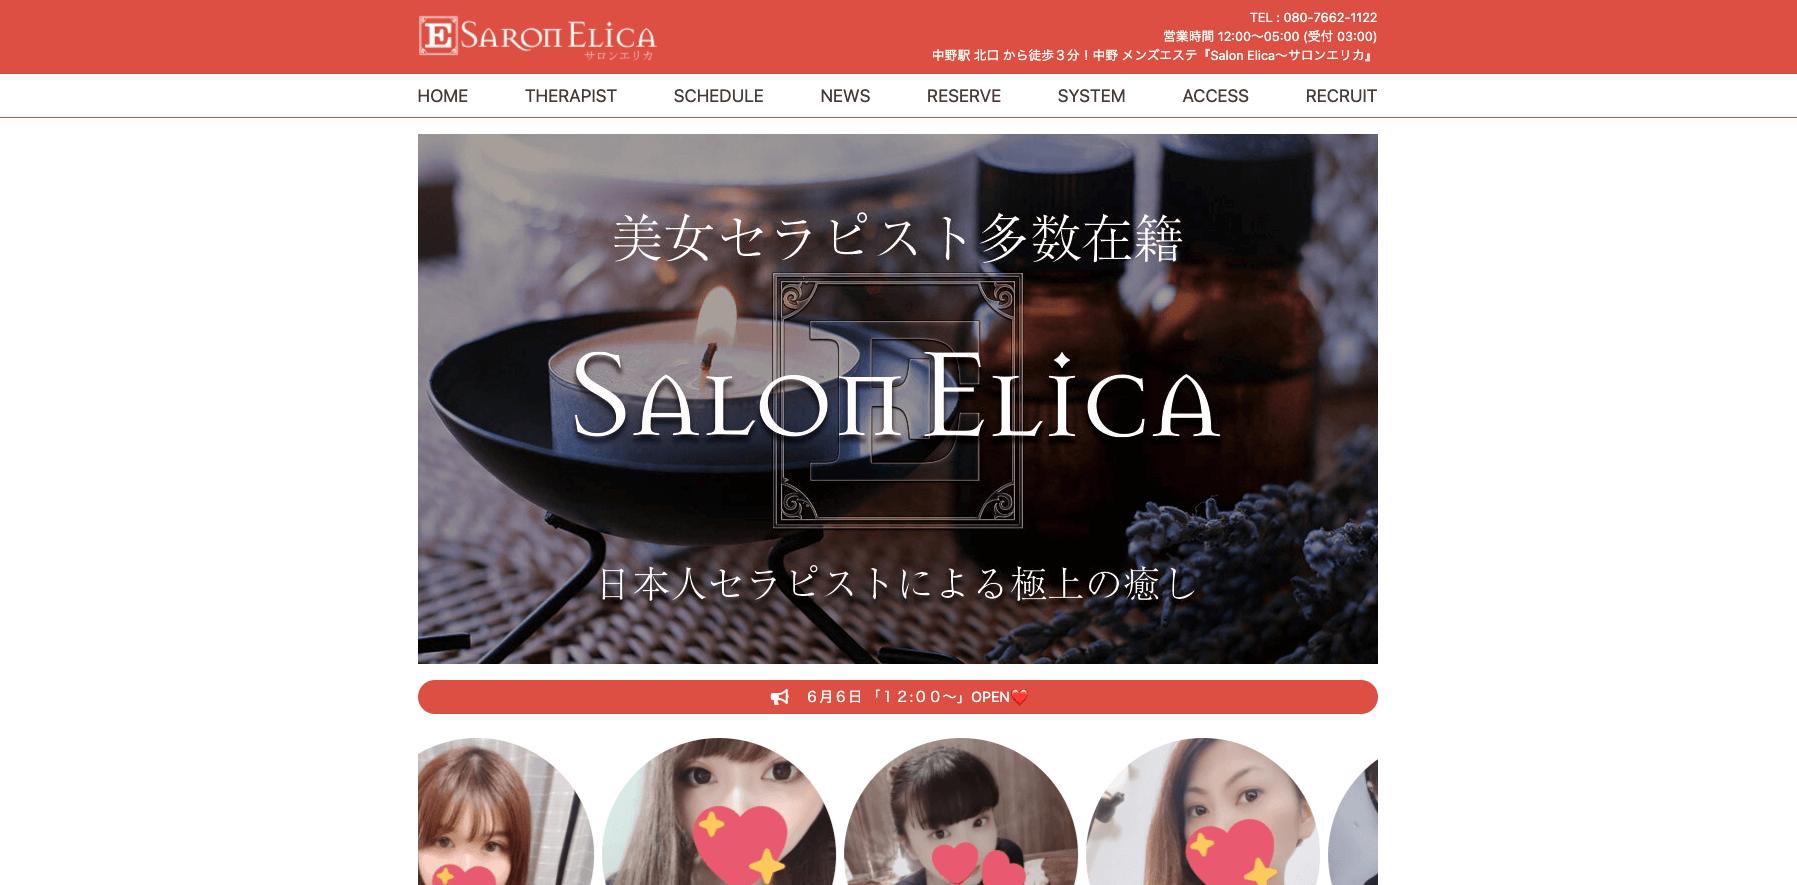 Salon Elica(サロンエリカ)